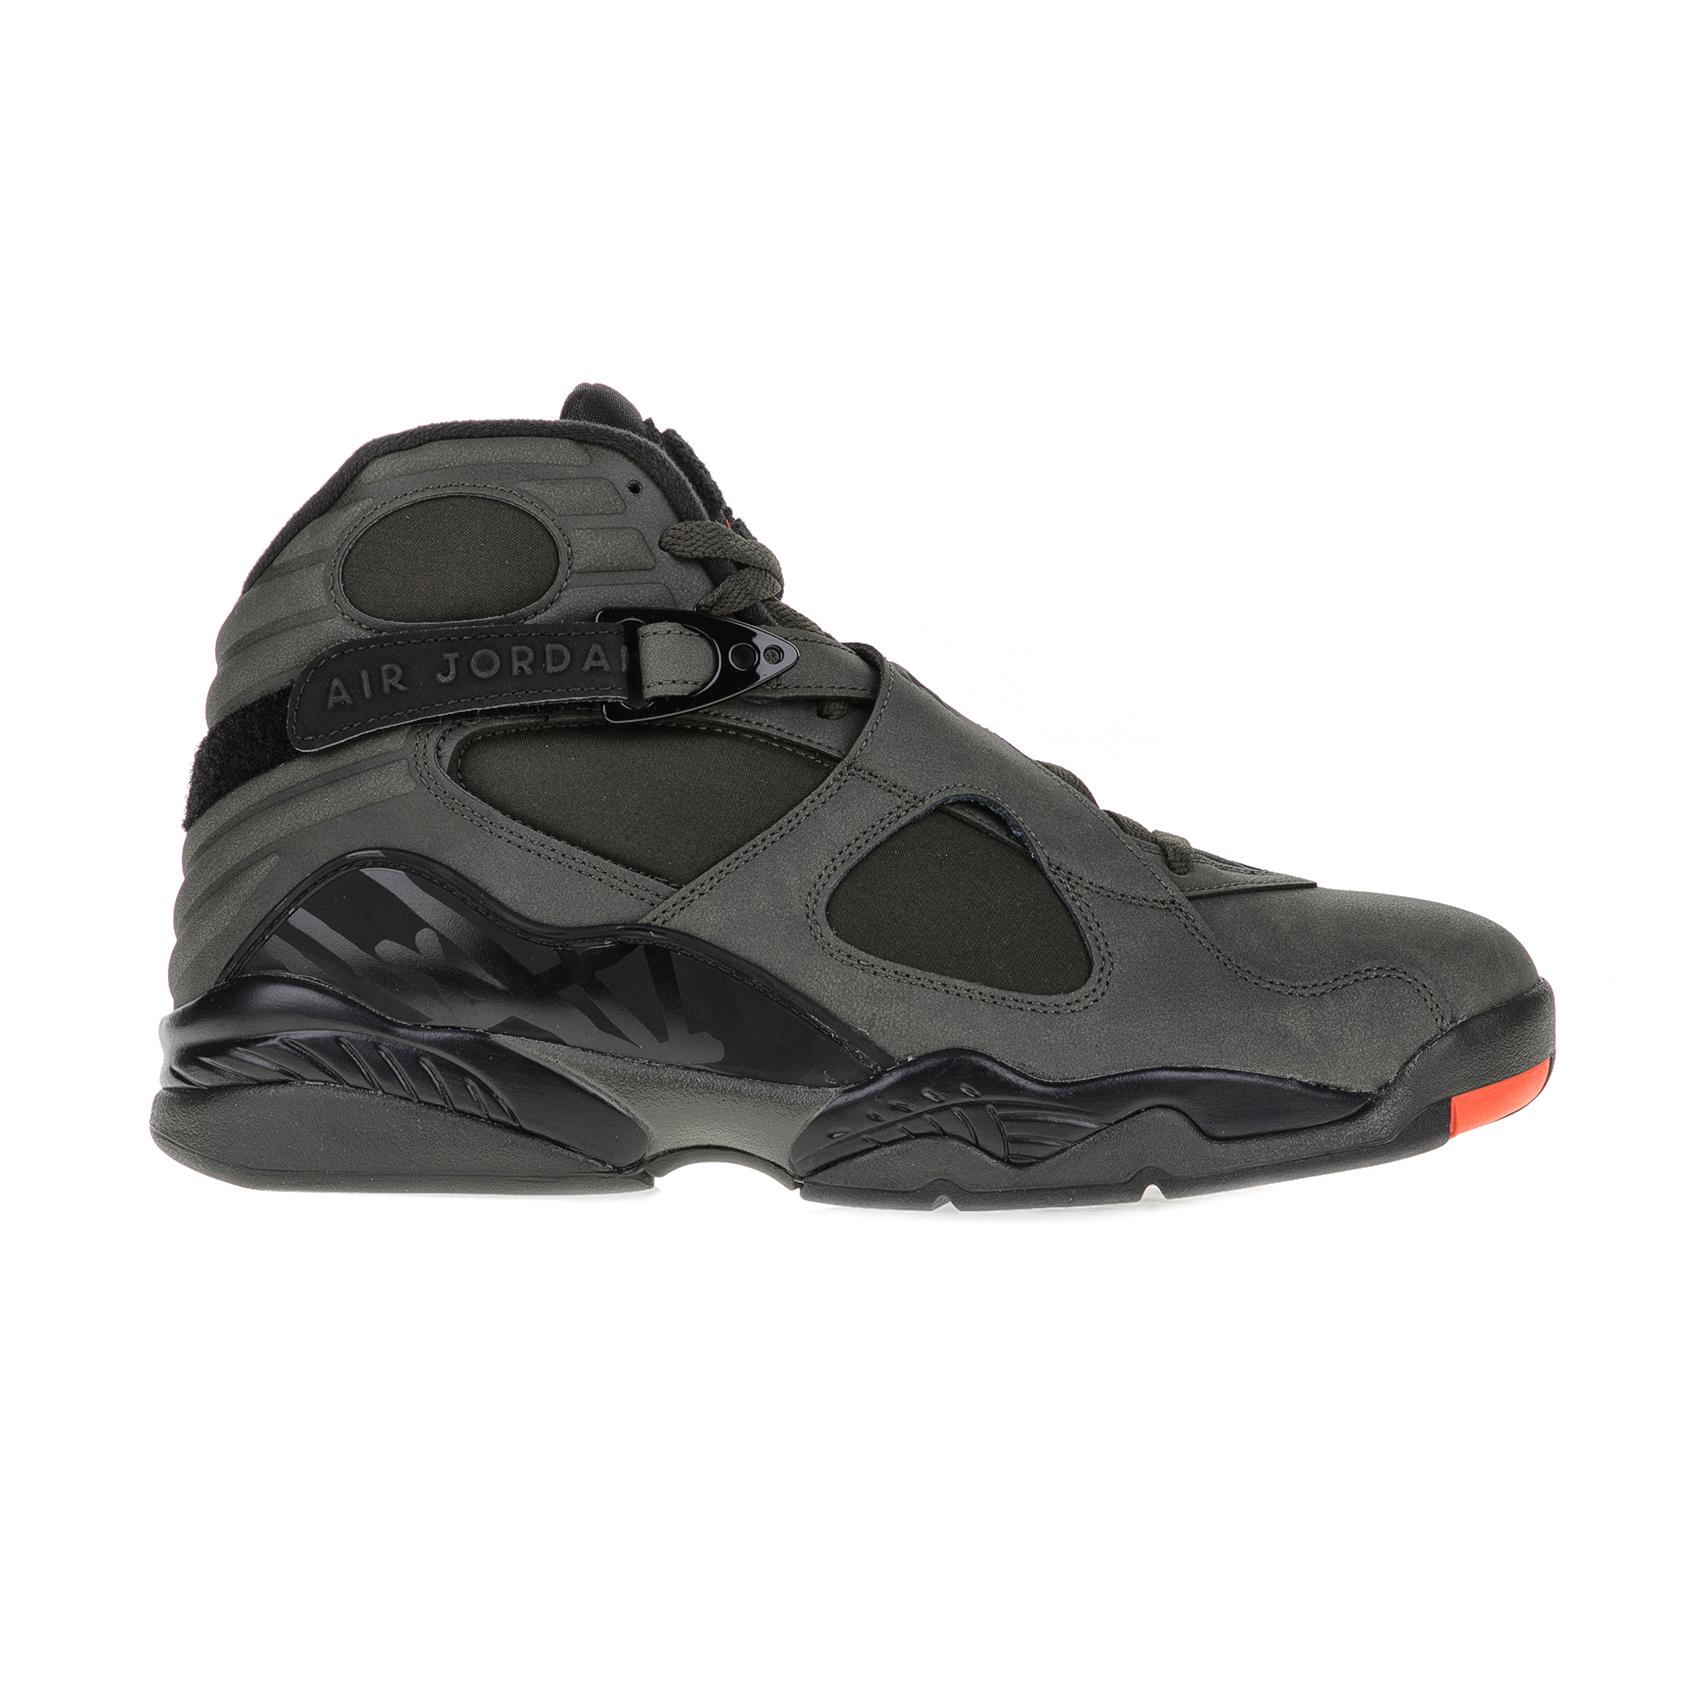 NIKE – Ανδρικά παπούτσια μπάσκετ ΝΙΚΕ AIR JORDAN 8 RETRO γκρι